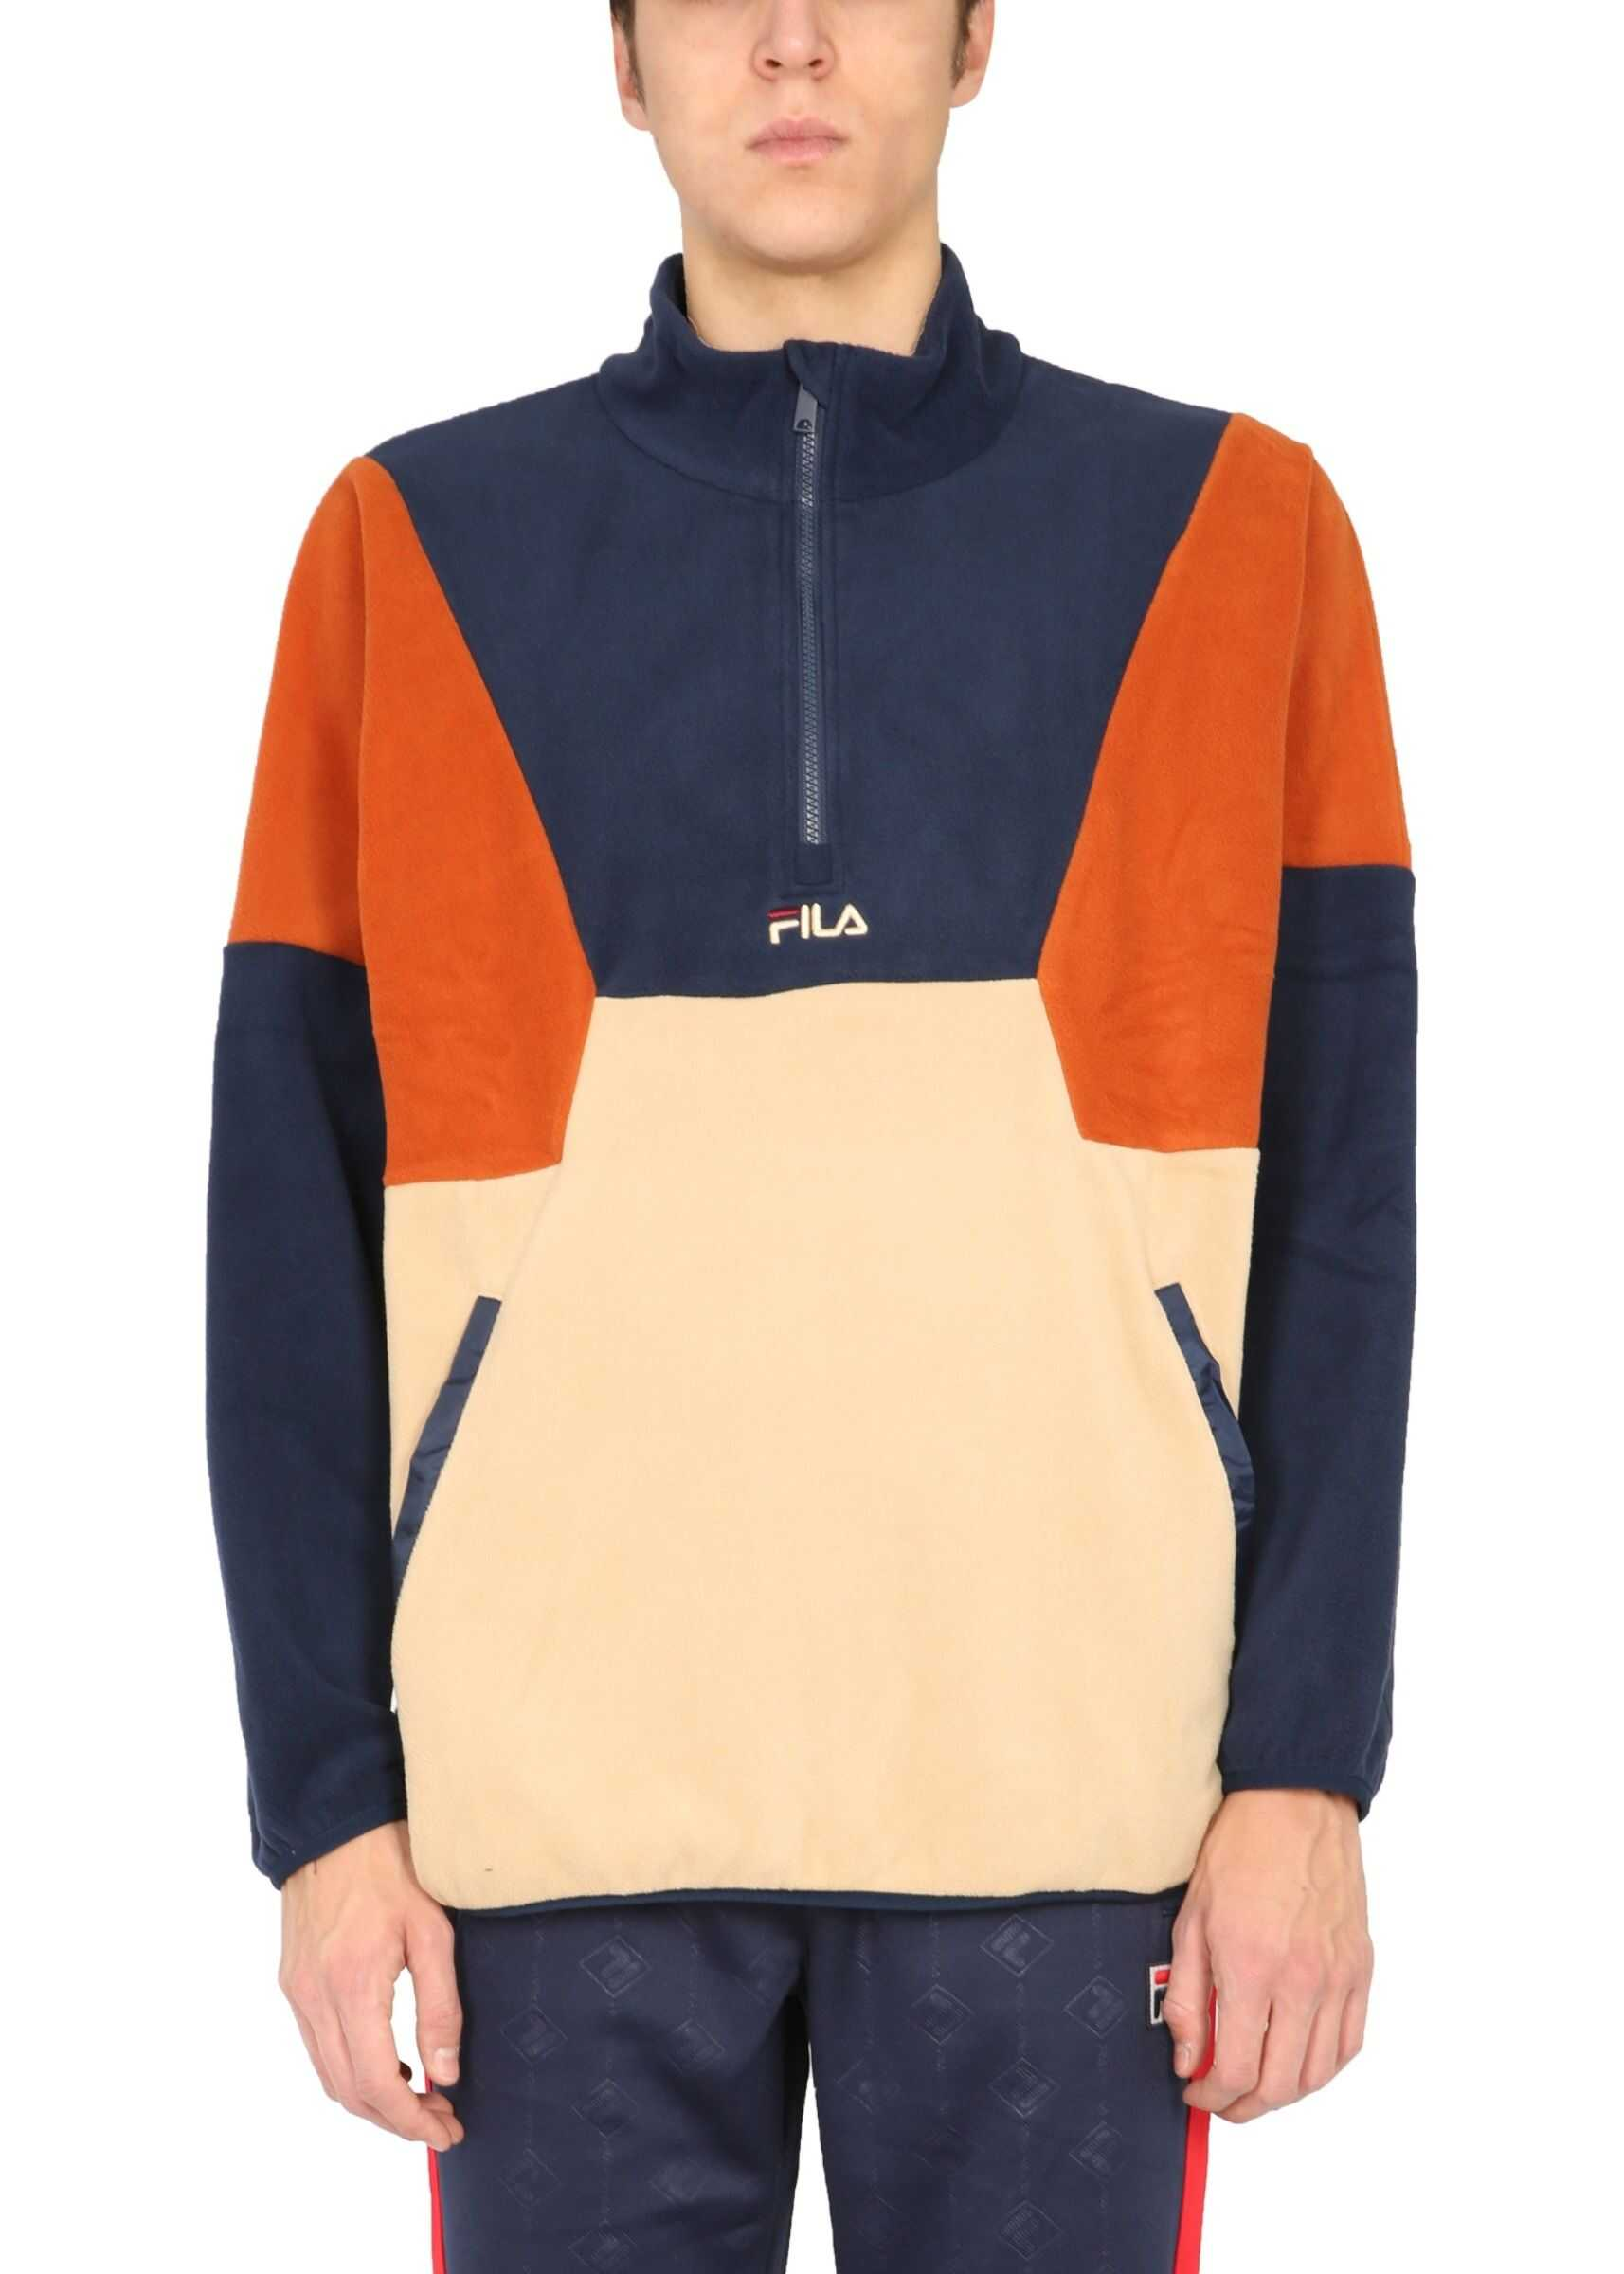 Fila Fleece Sweatshirt MULTICOLOUR imagine